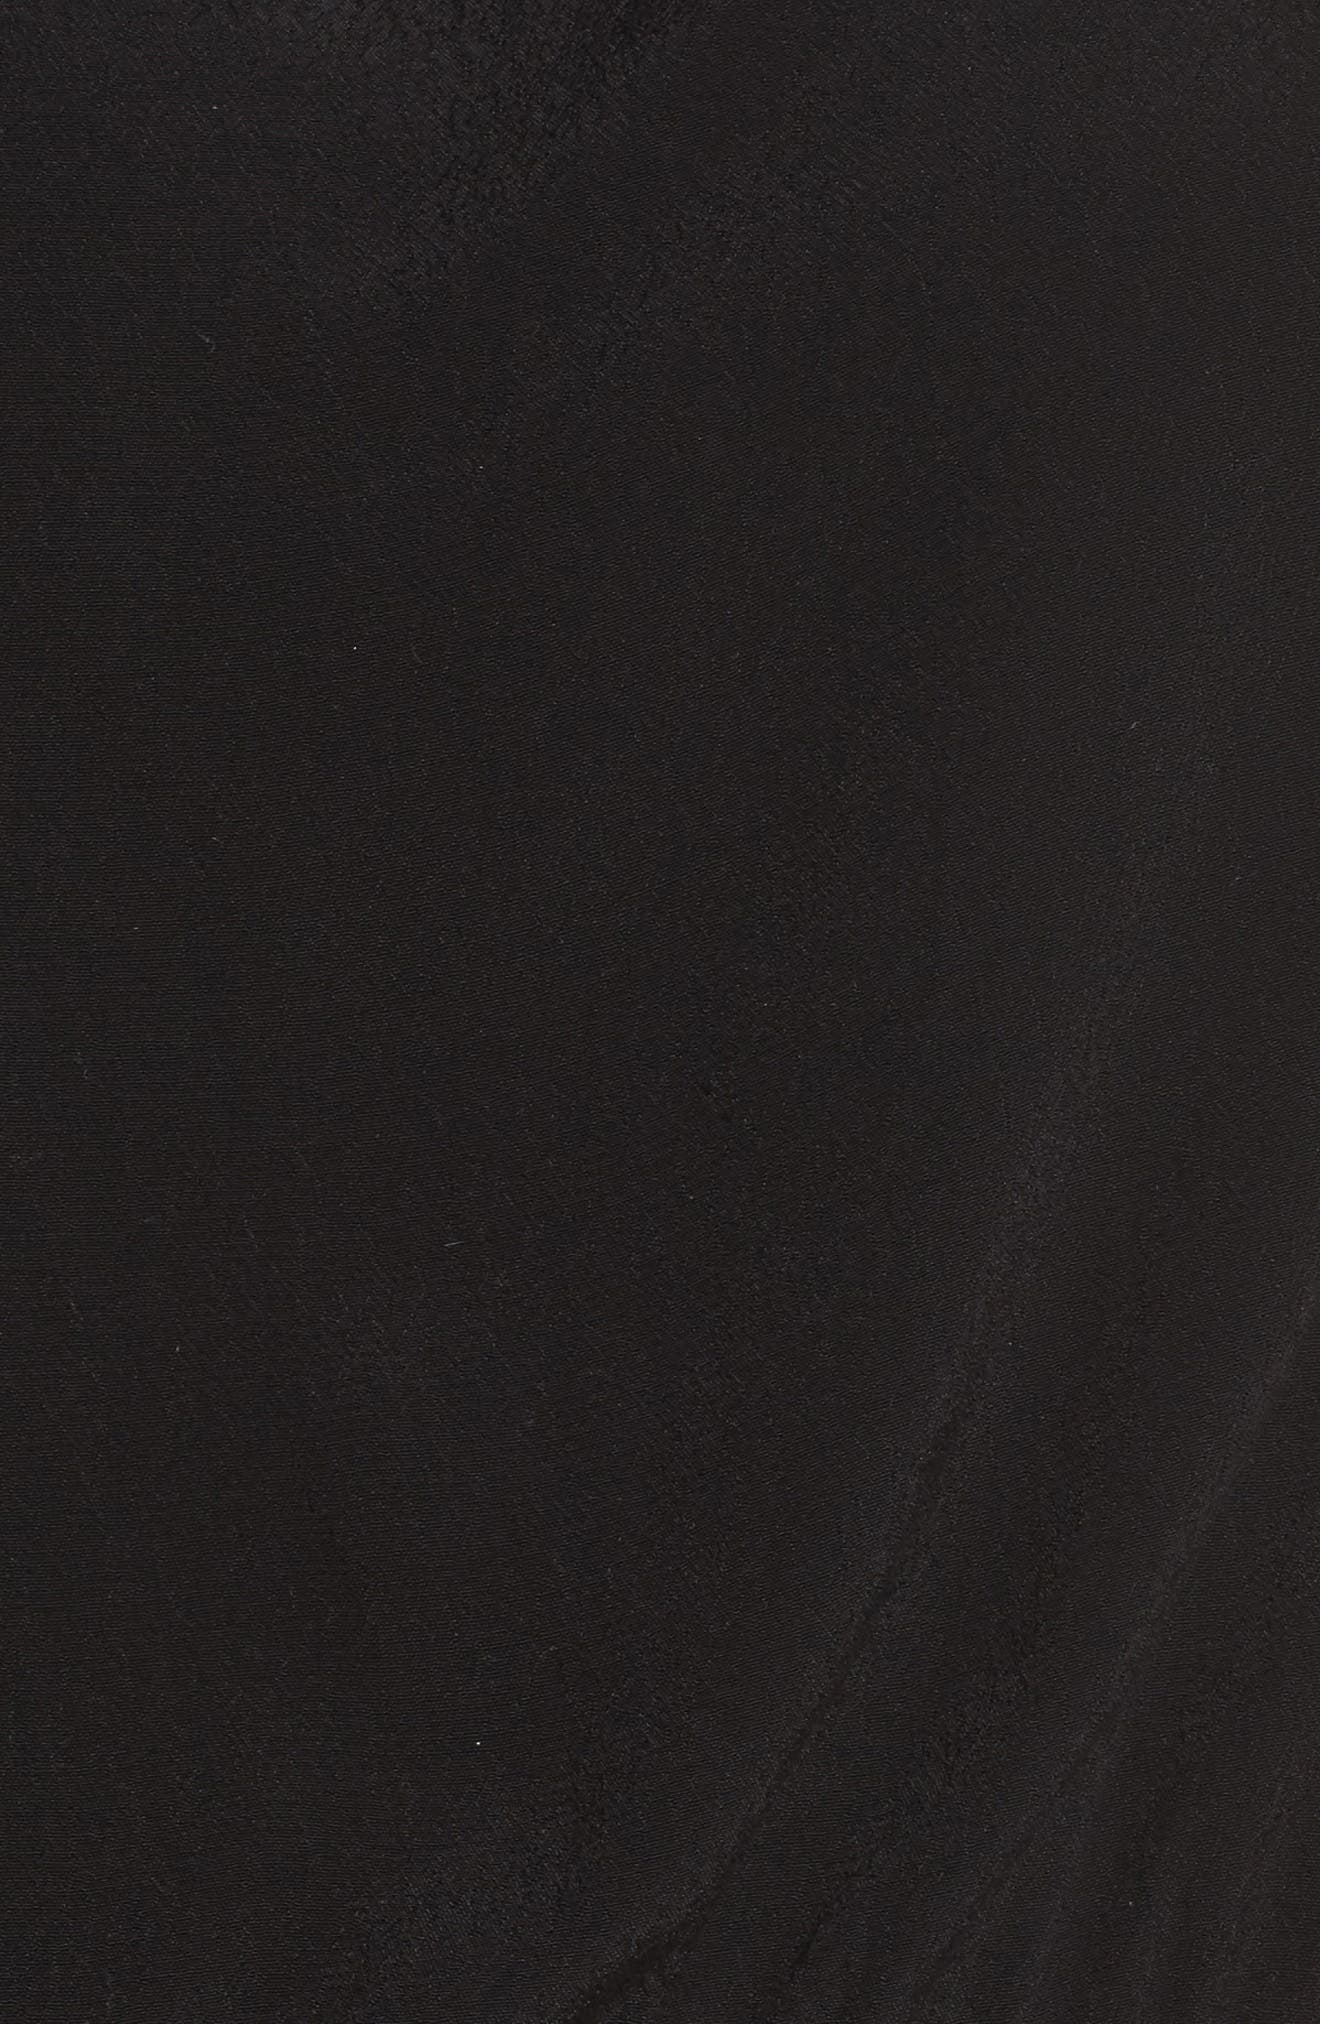 Cold Shoulder Jumpsuit,                             Alternate thumbnail 5, color,                             Black Gold